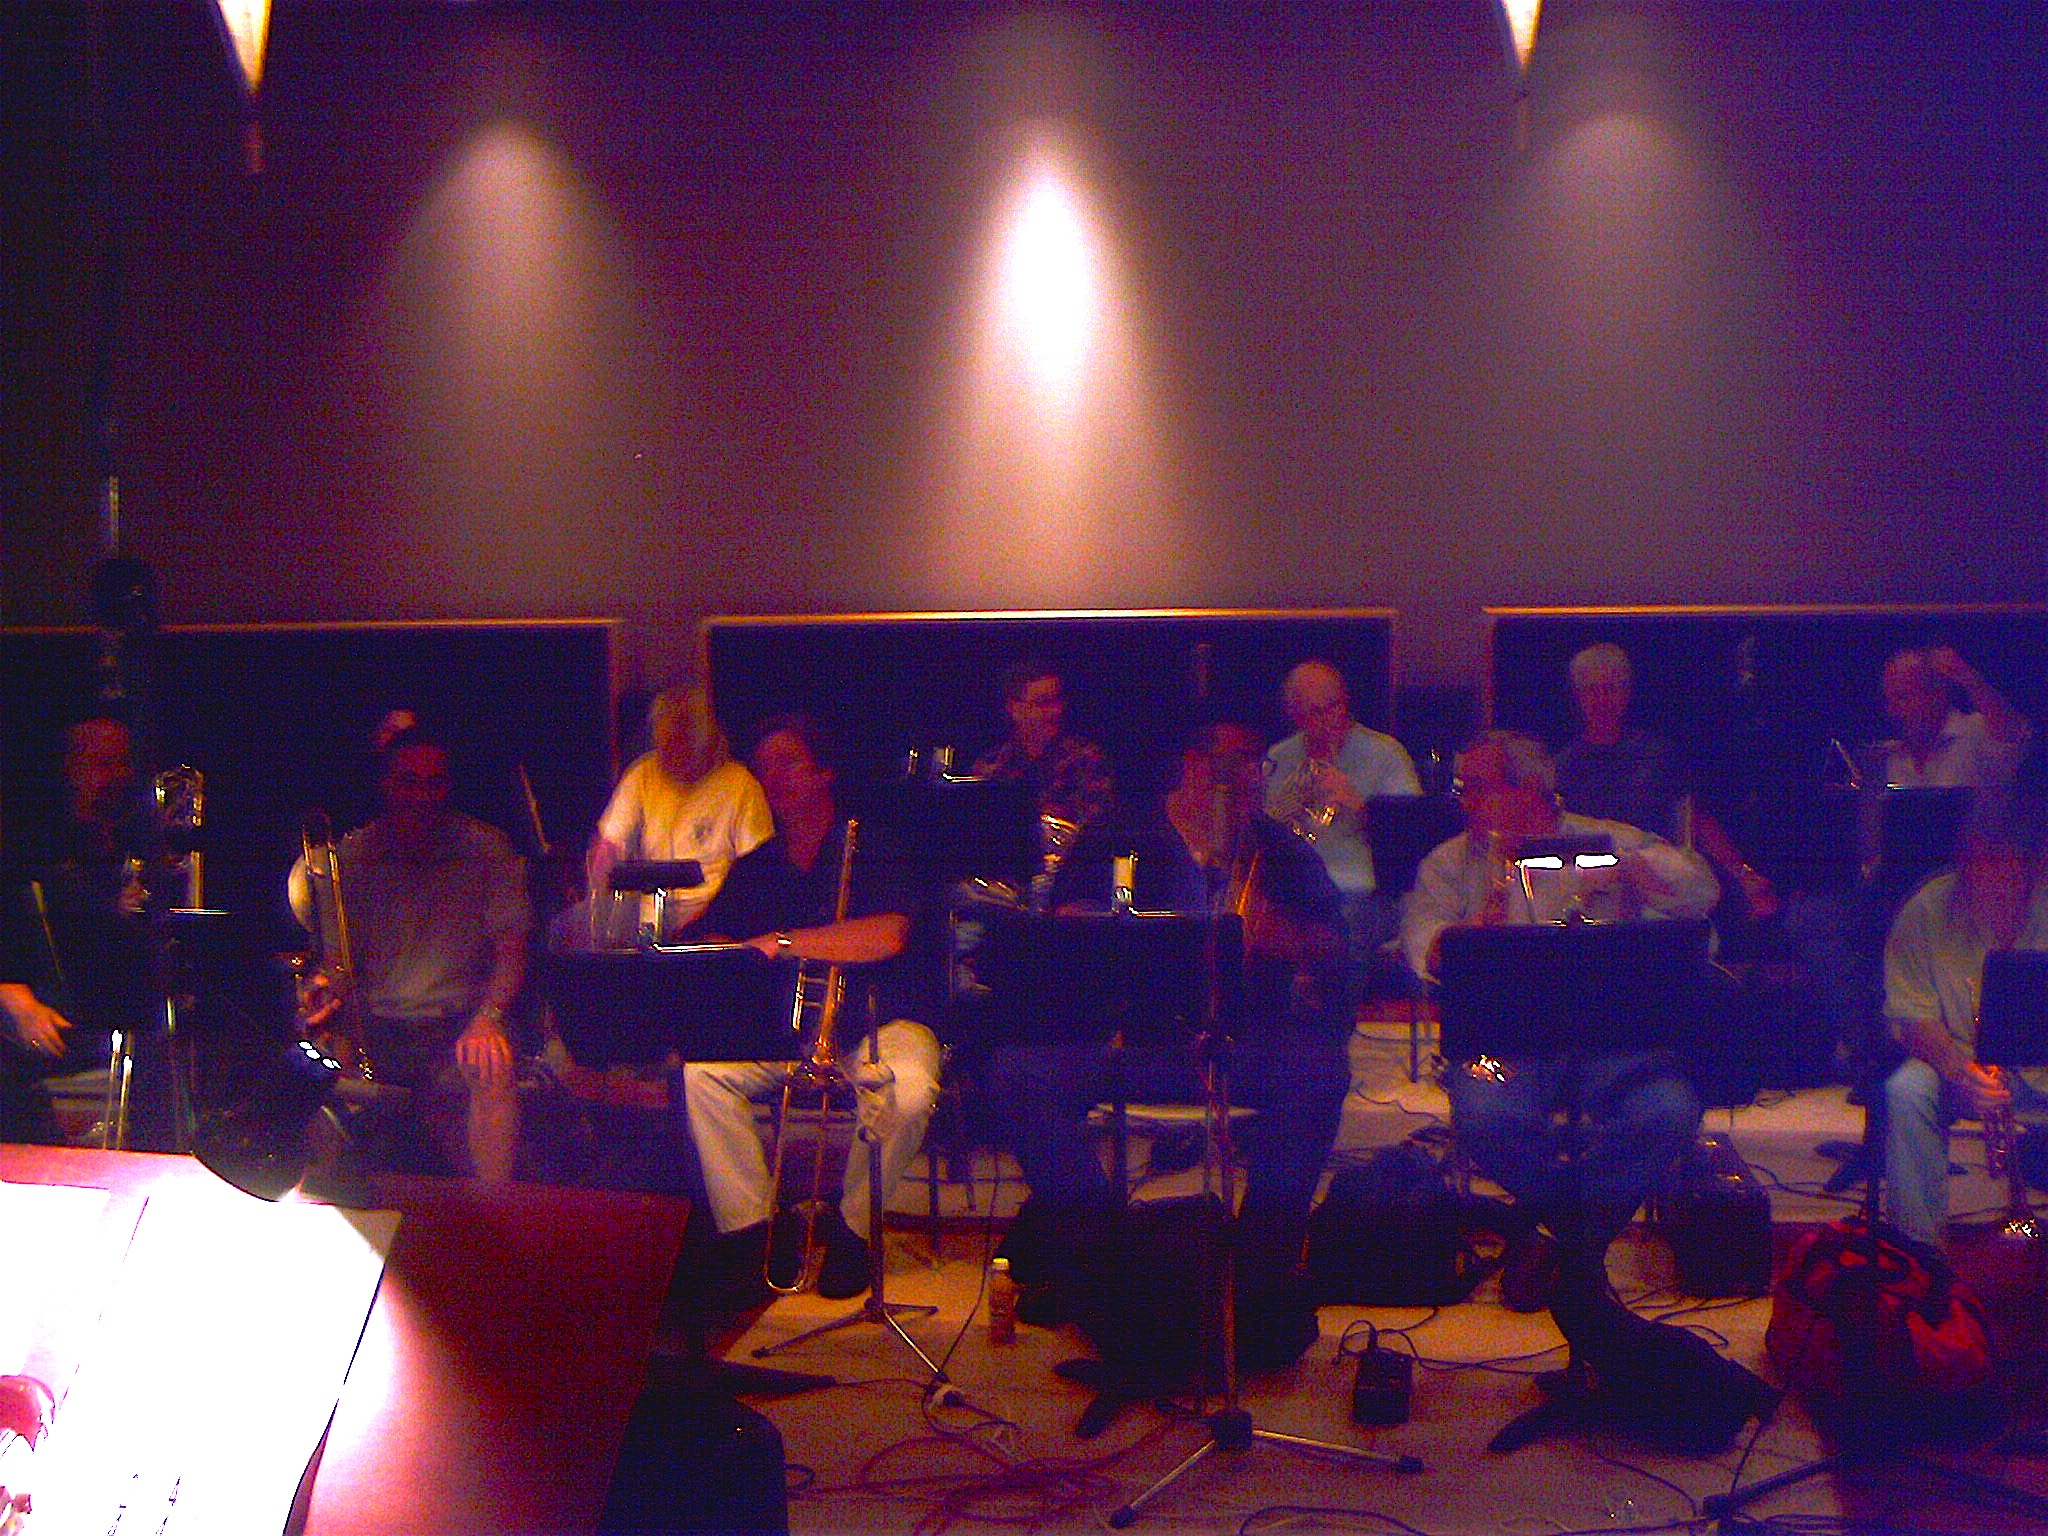 In StudioEar 2 EarAudio Production